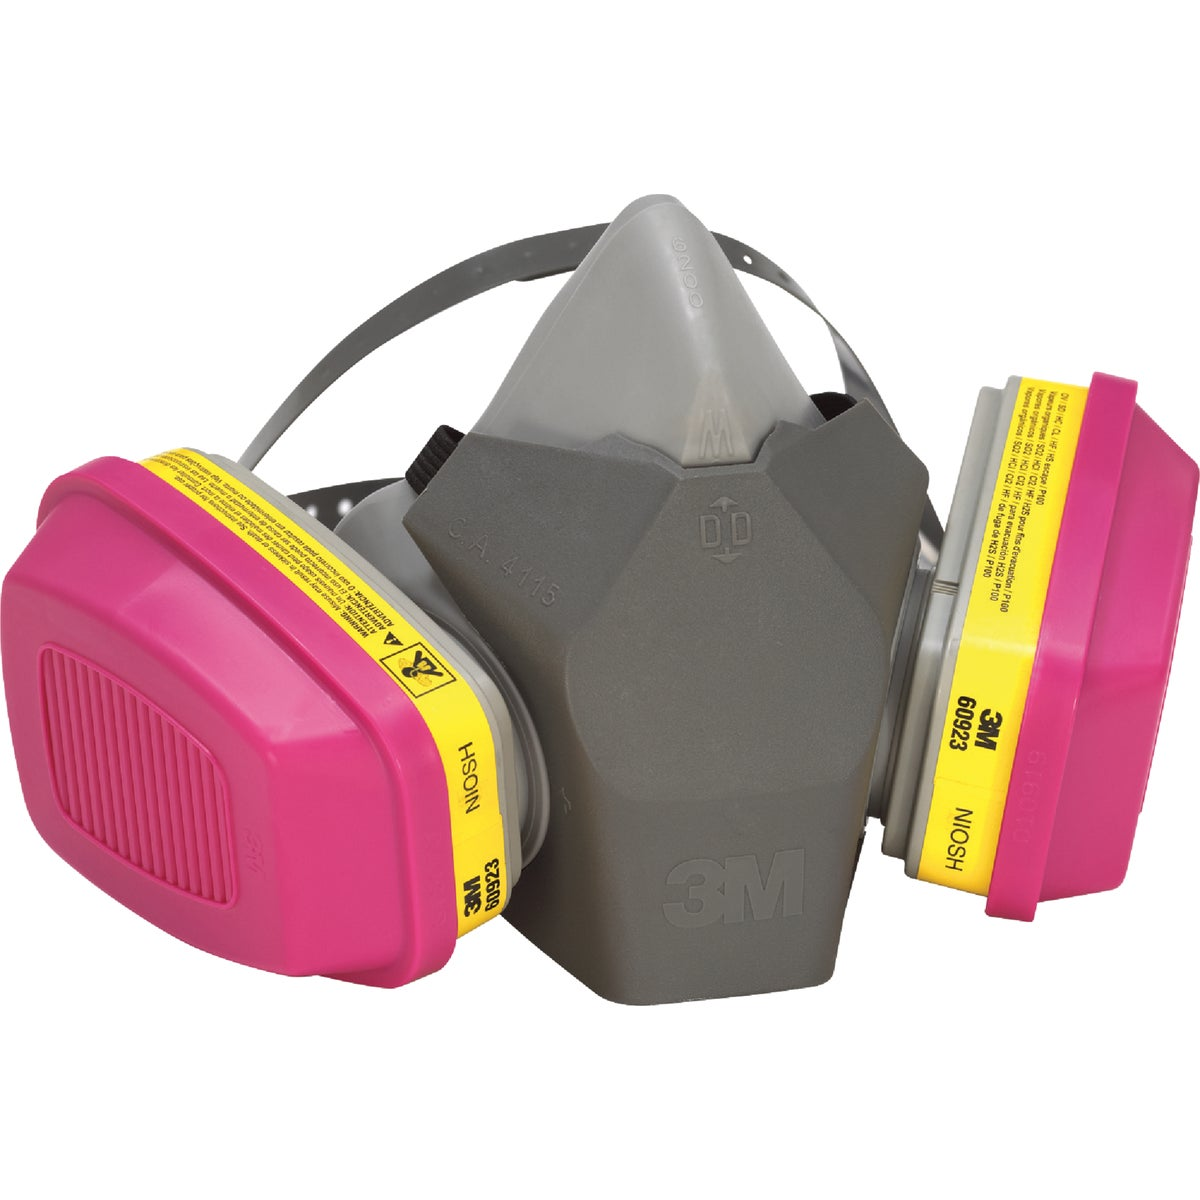 3M OV/AG/P100 Professional Multi-Purpose Respirator with Drop Down